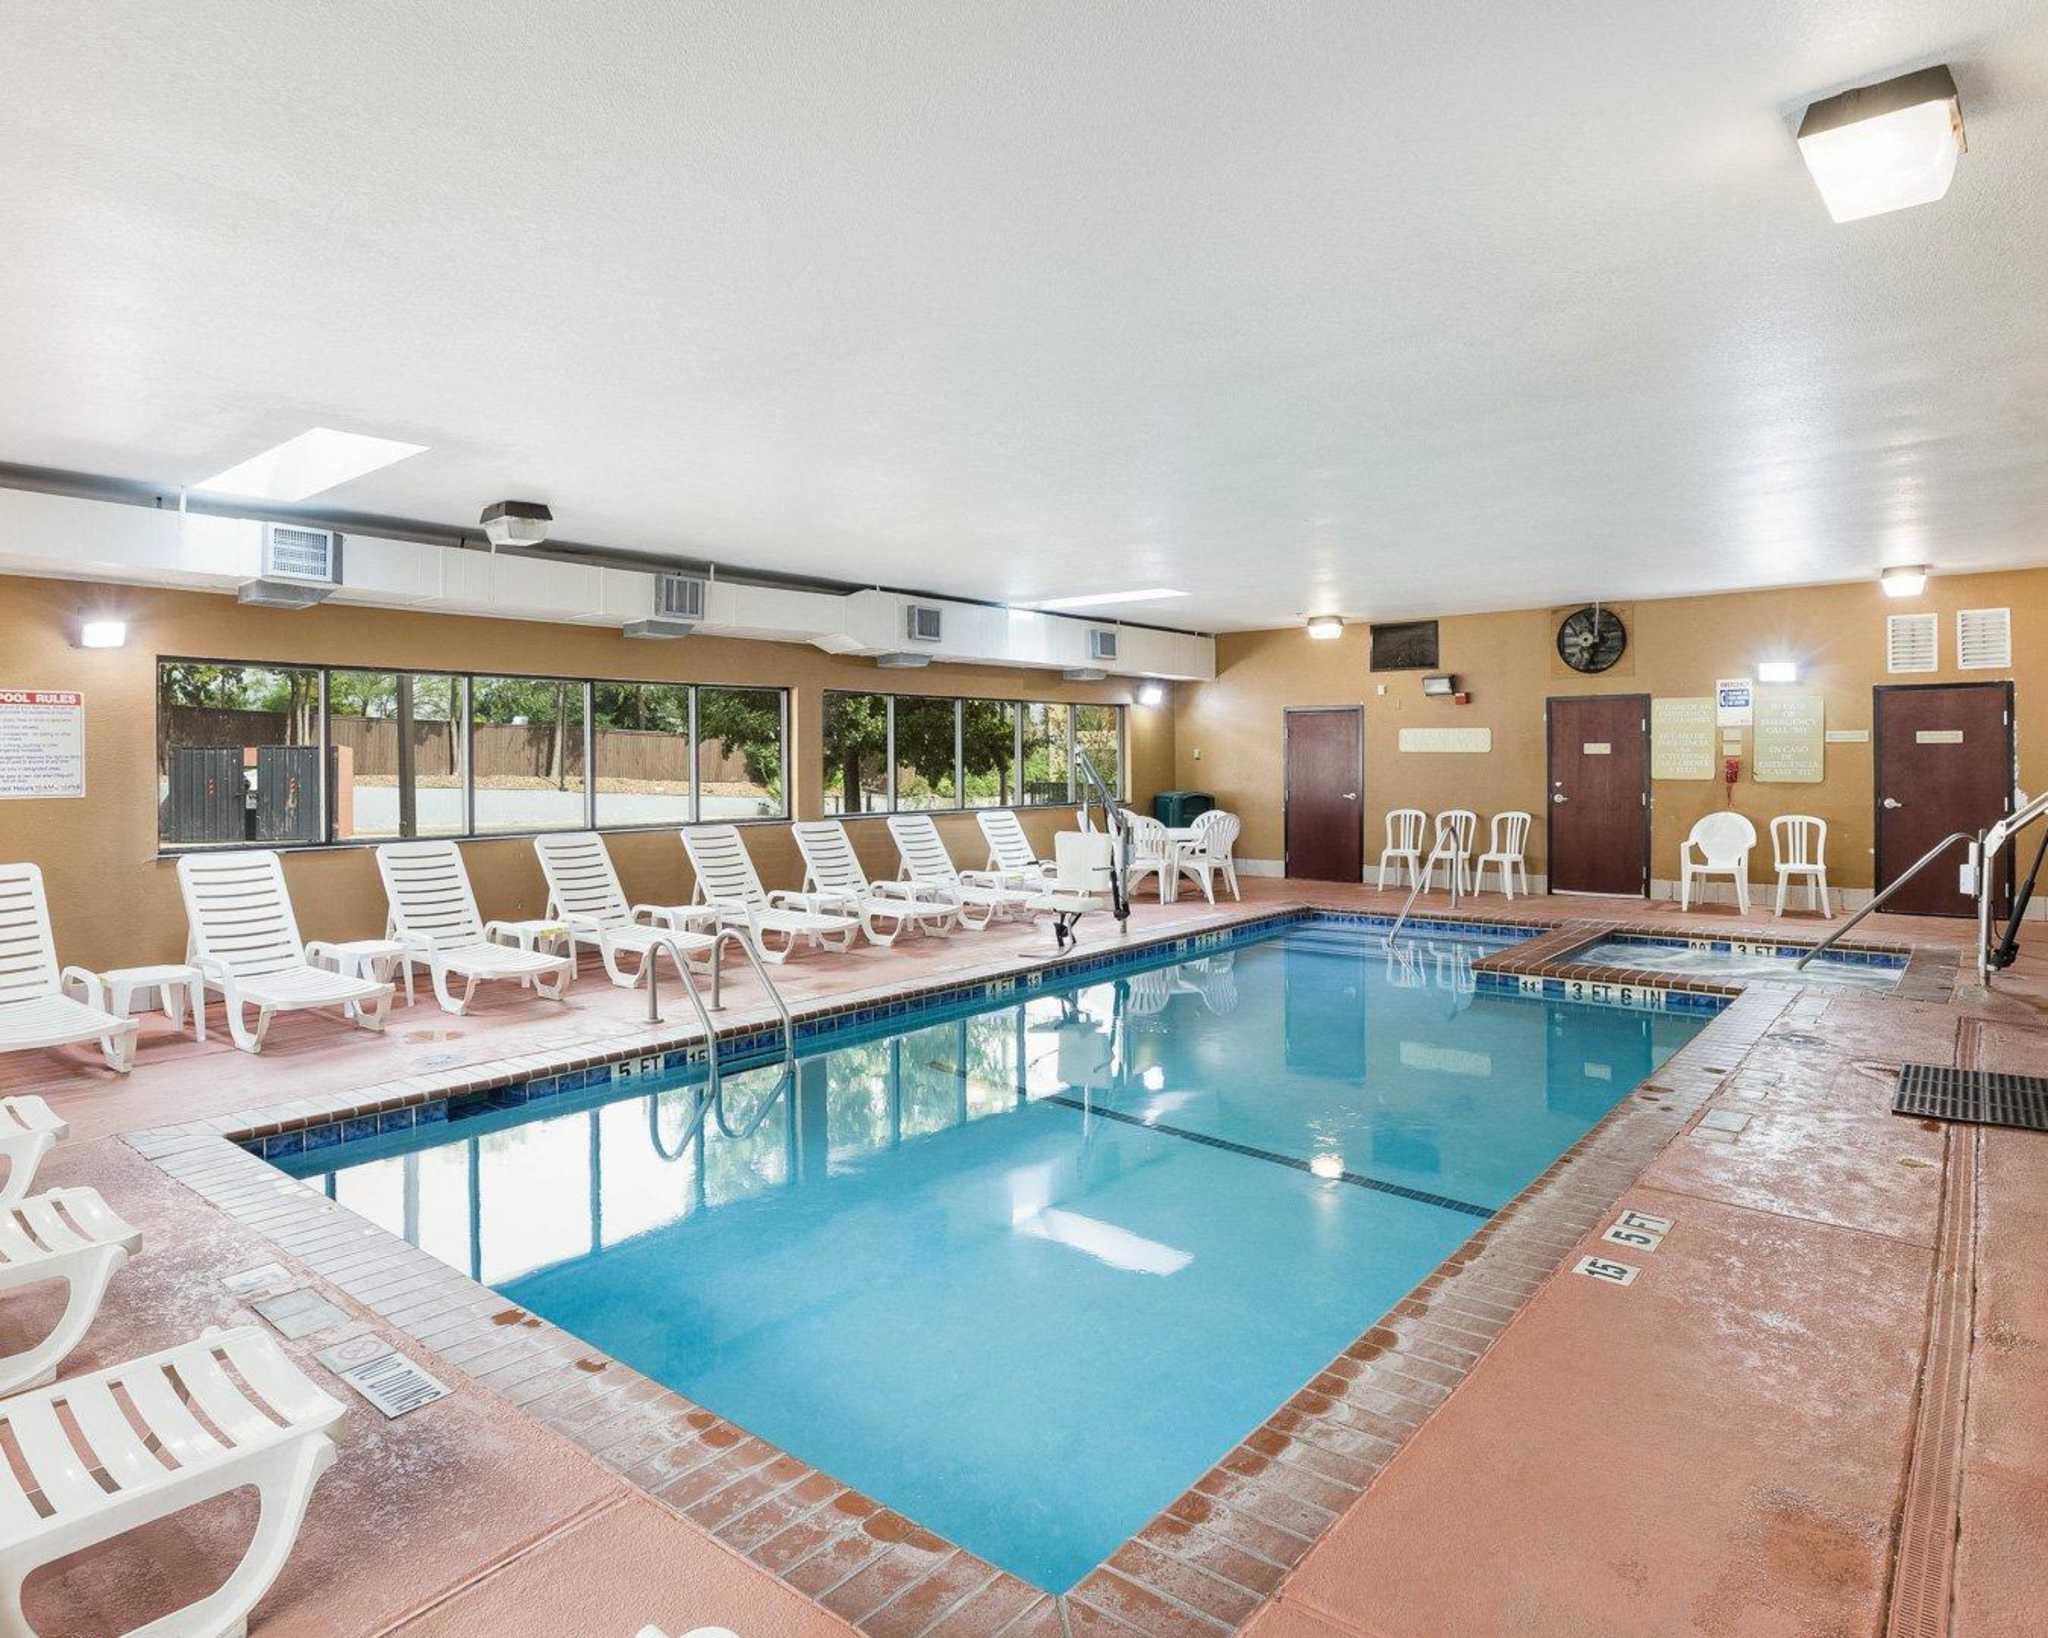 Comfort Inn & Suites Near Medical Center image 8